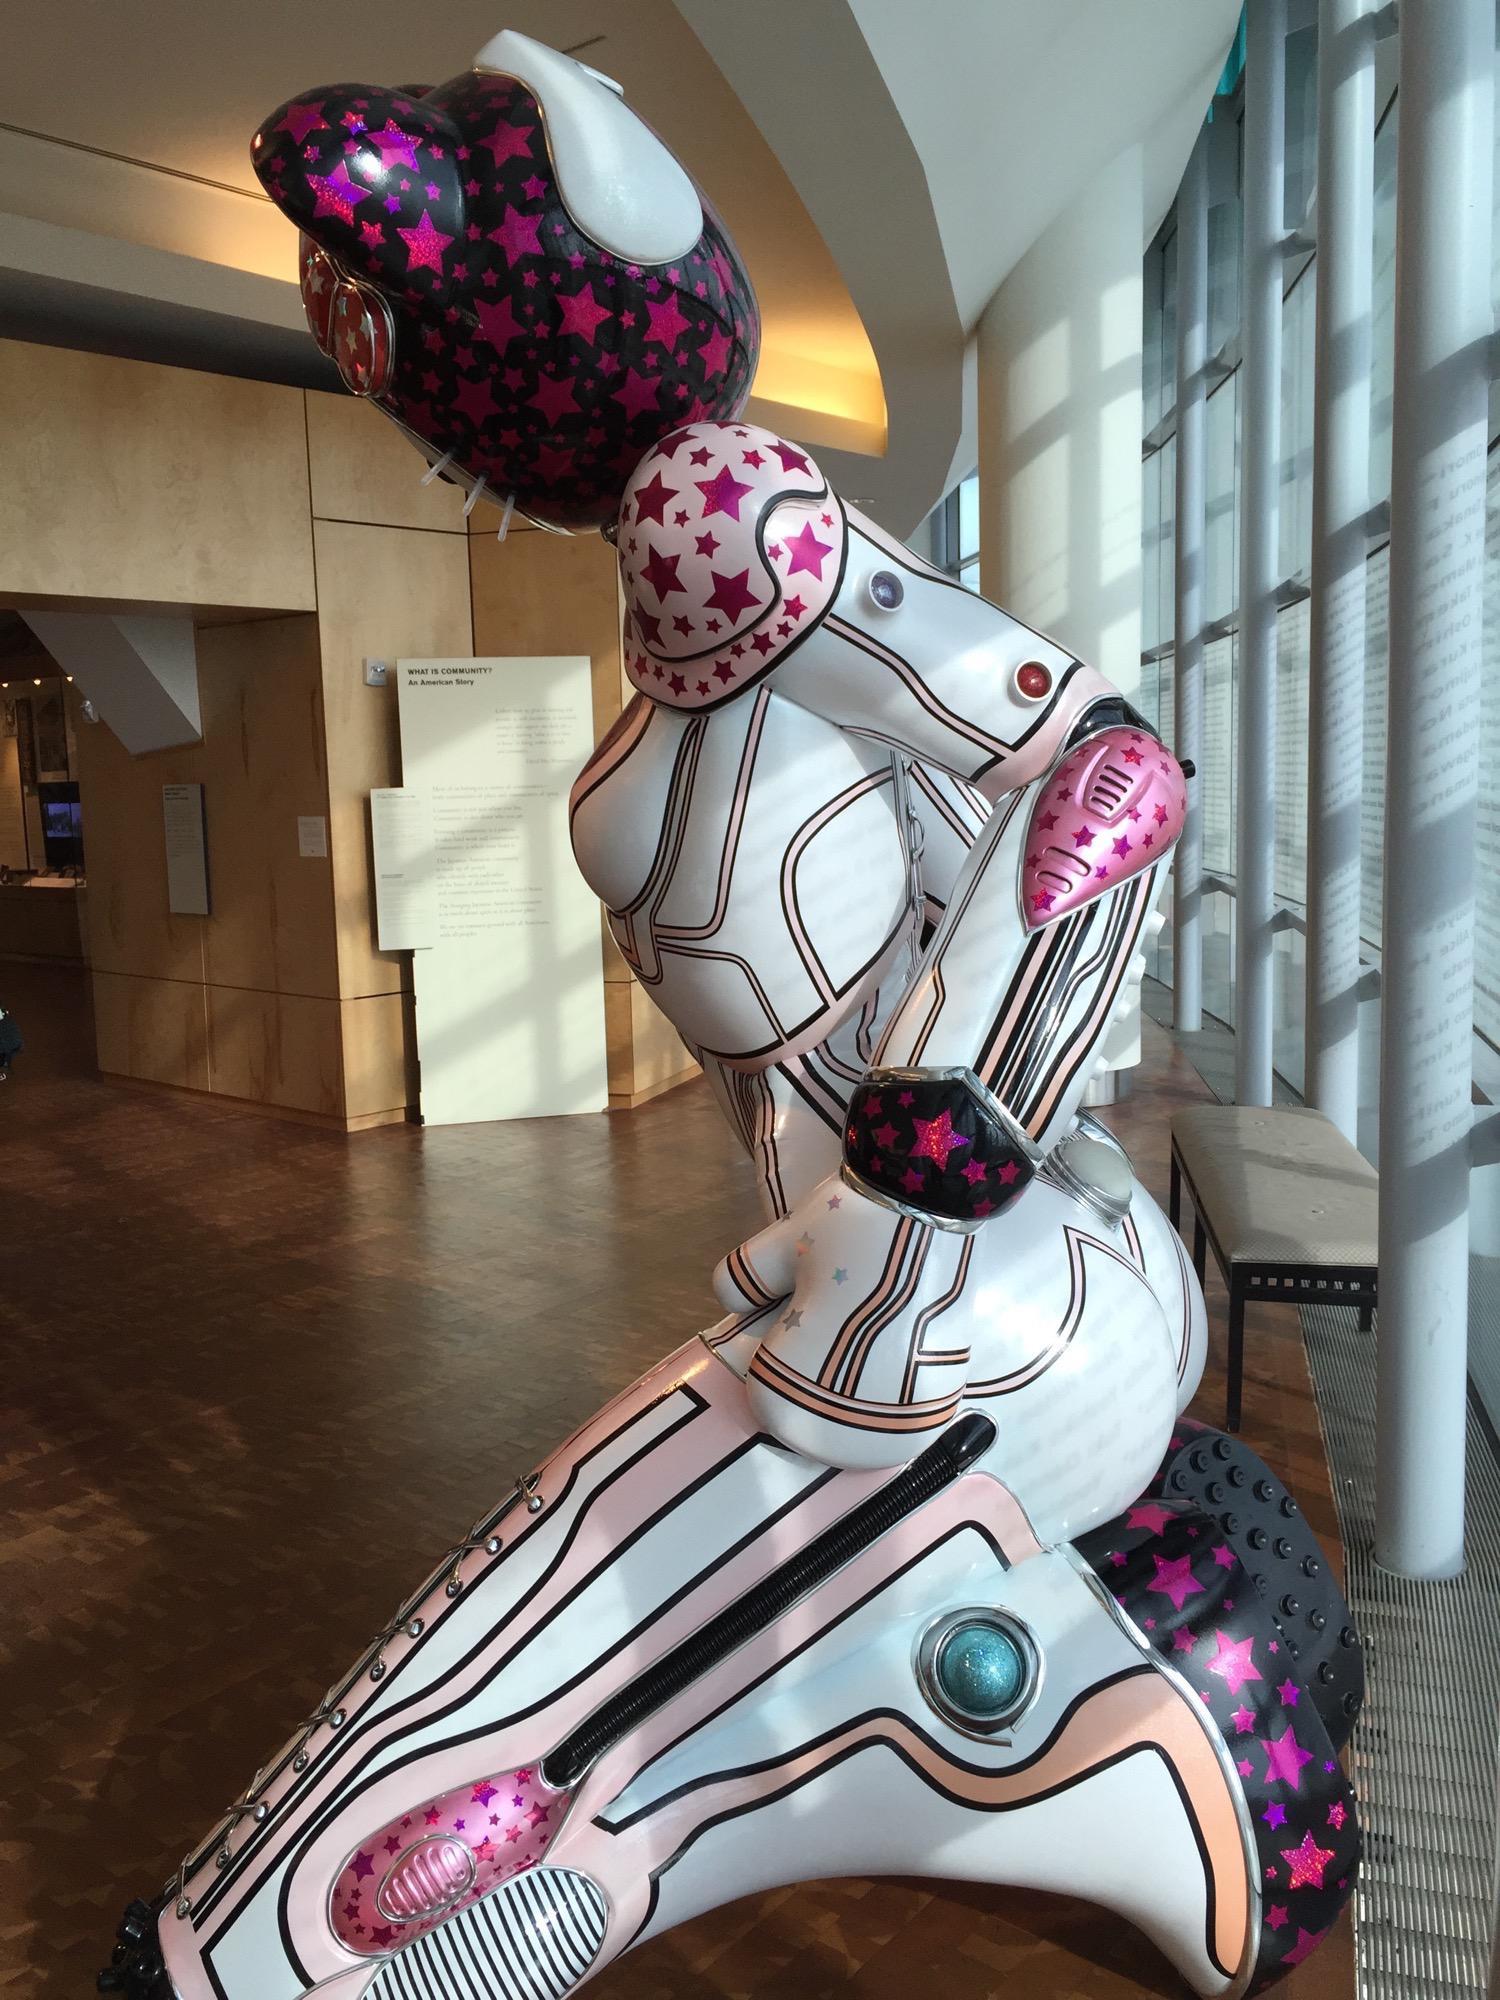 Hello! Exploring the Superweird world of Hello Kitty